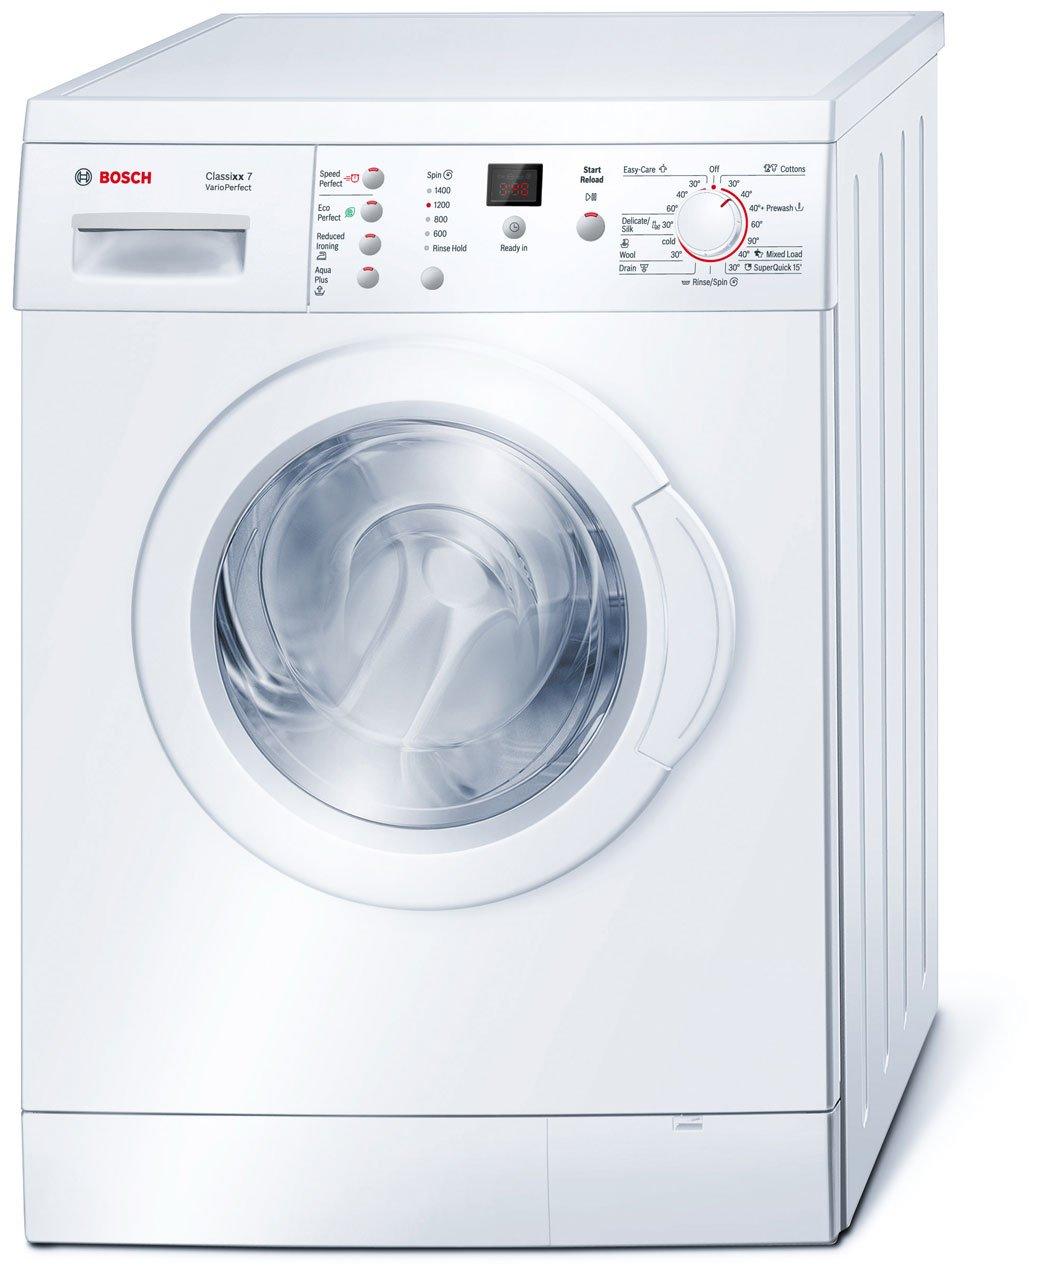 Bosch Maxx 7 Manual Dryer Sample User Manual